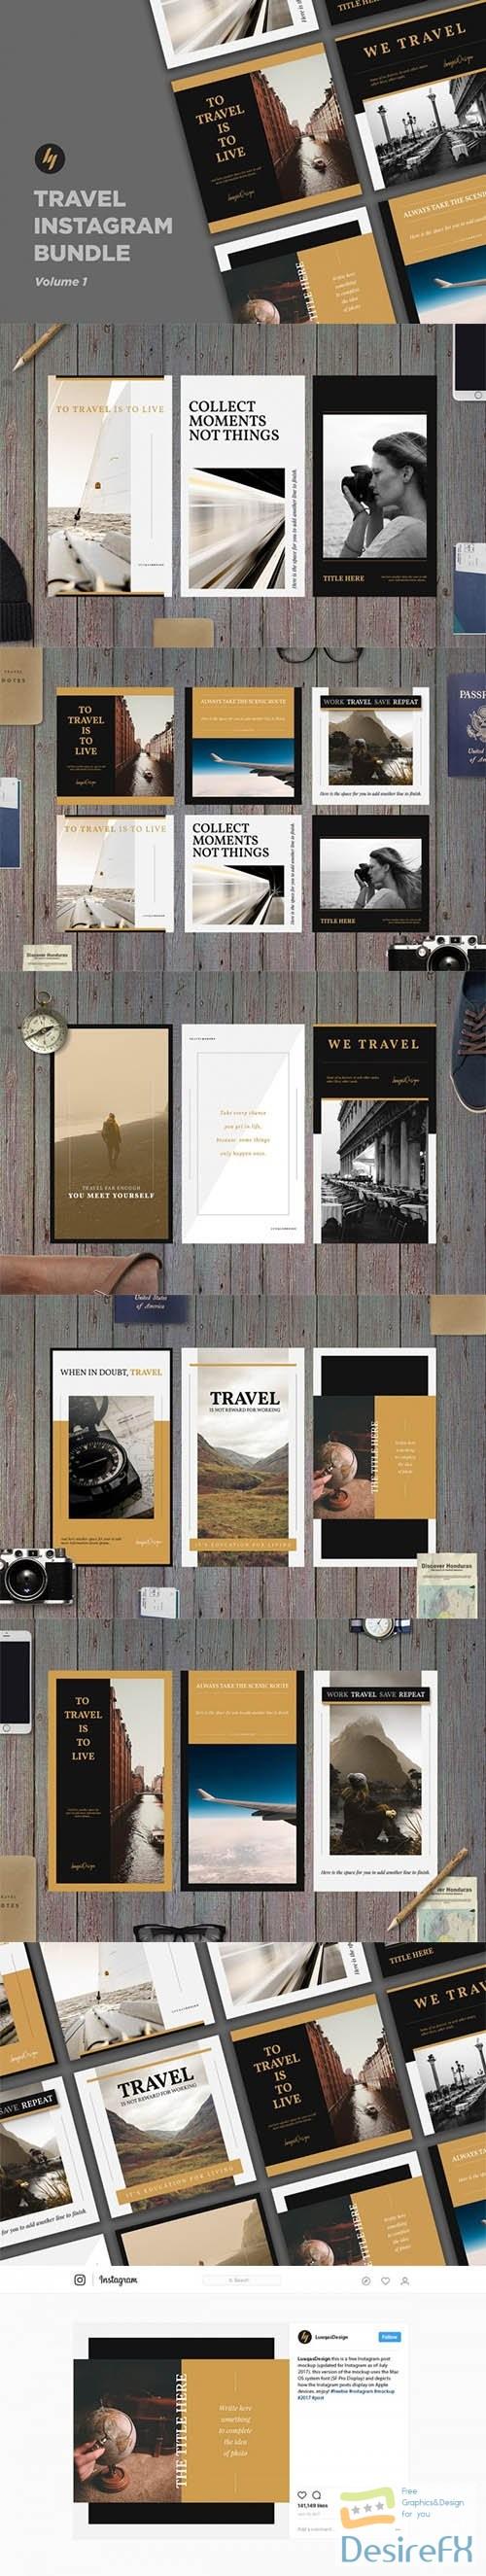 Travel Instagram Template Pack